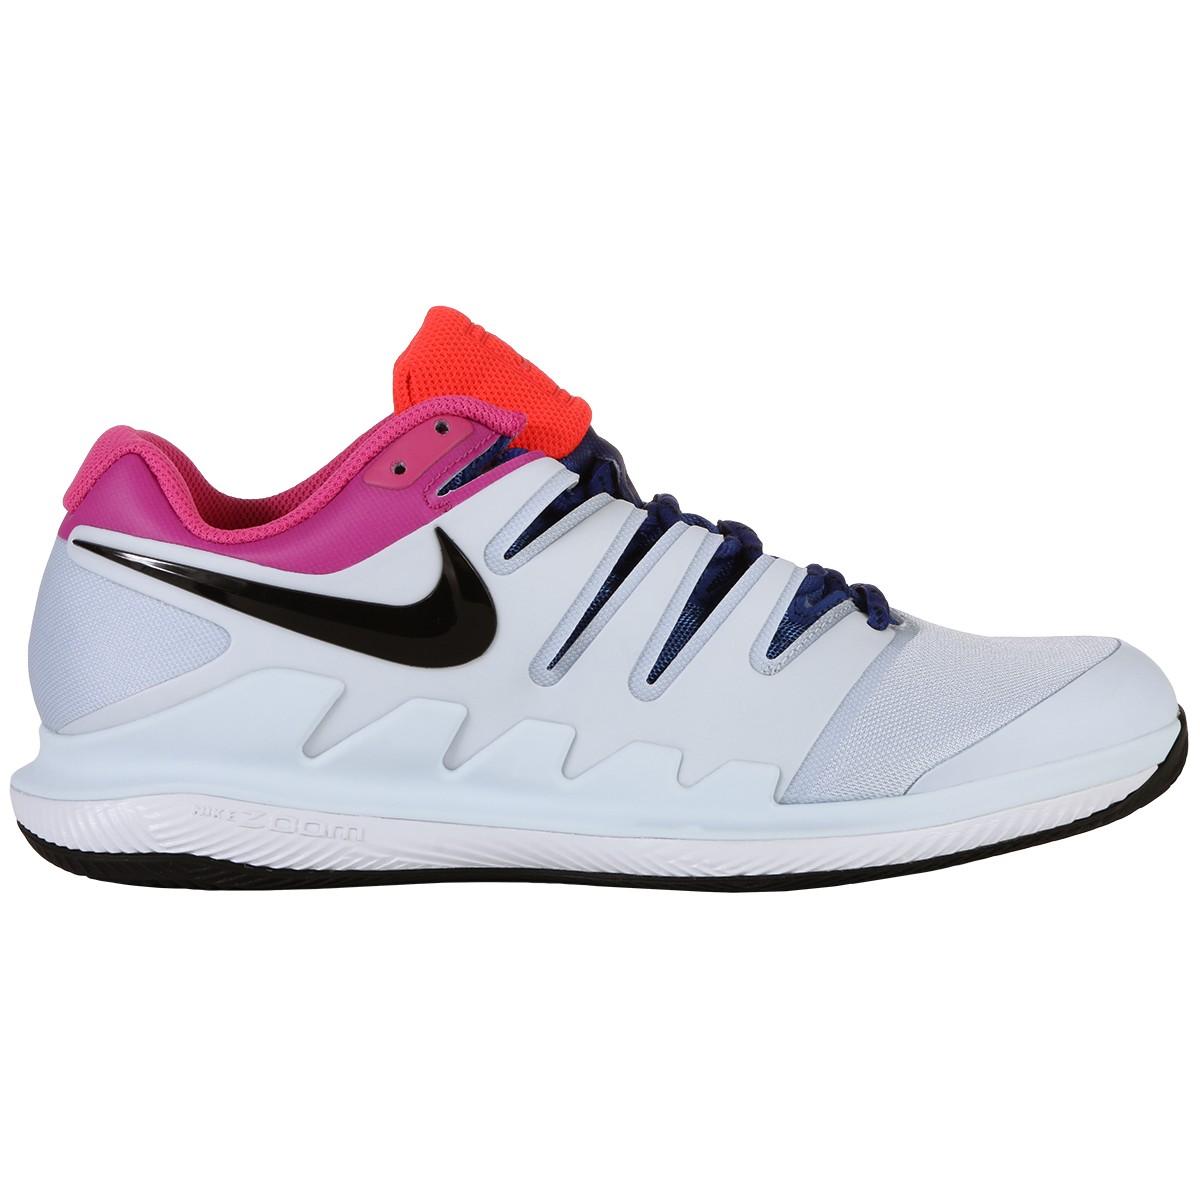 chaussure tennis battue tennis terre adidas chaussure ukXiwOPZTl